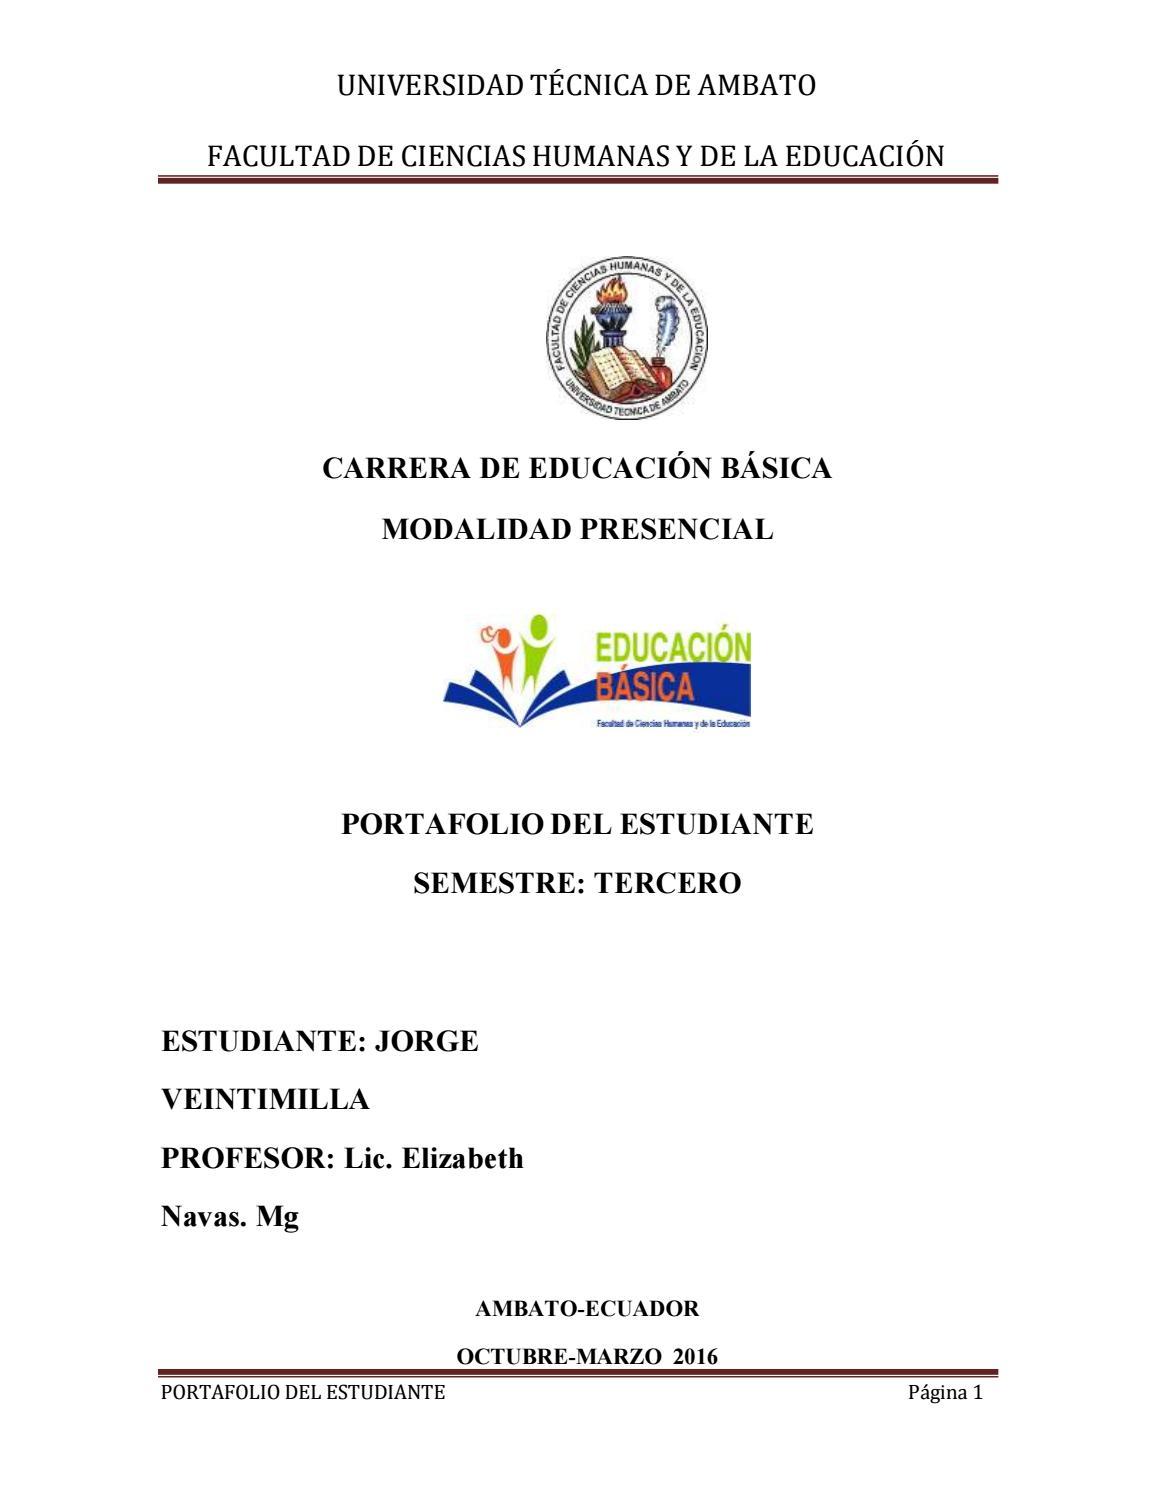 Veintimilla jorge portafolio planificacion curricular i by Jorge ...